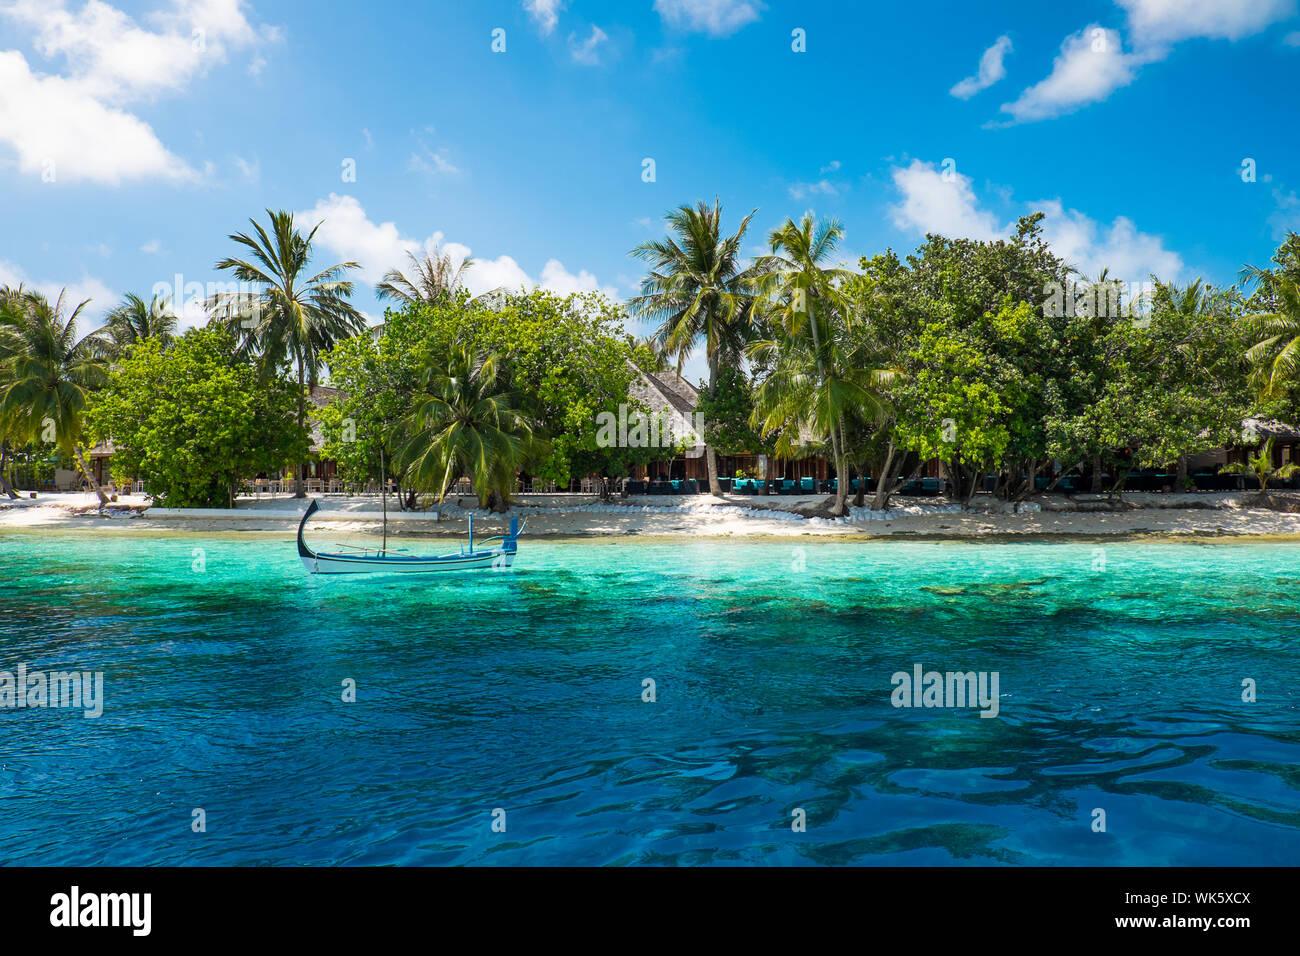 Hotel On The Island Maldives Indian Ocean Stock Photo